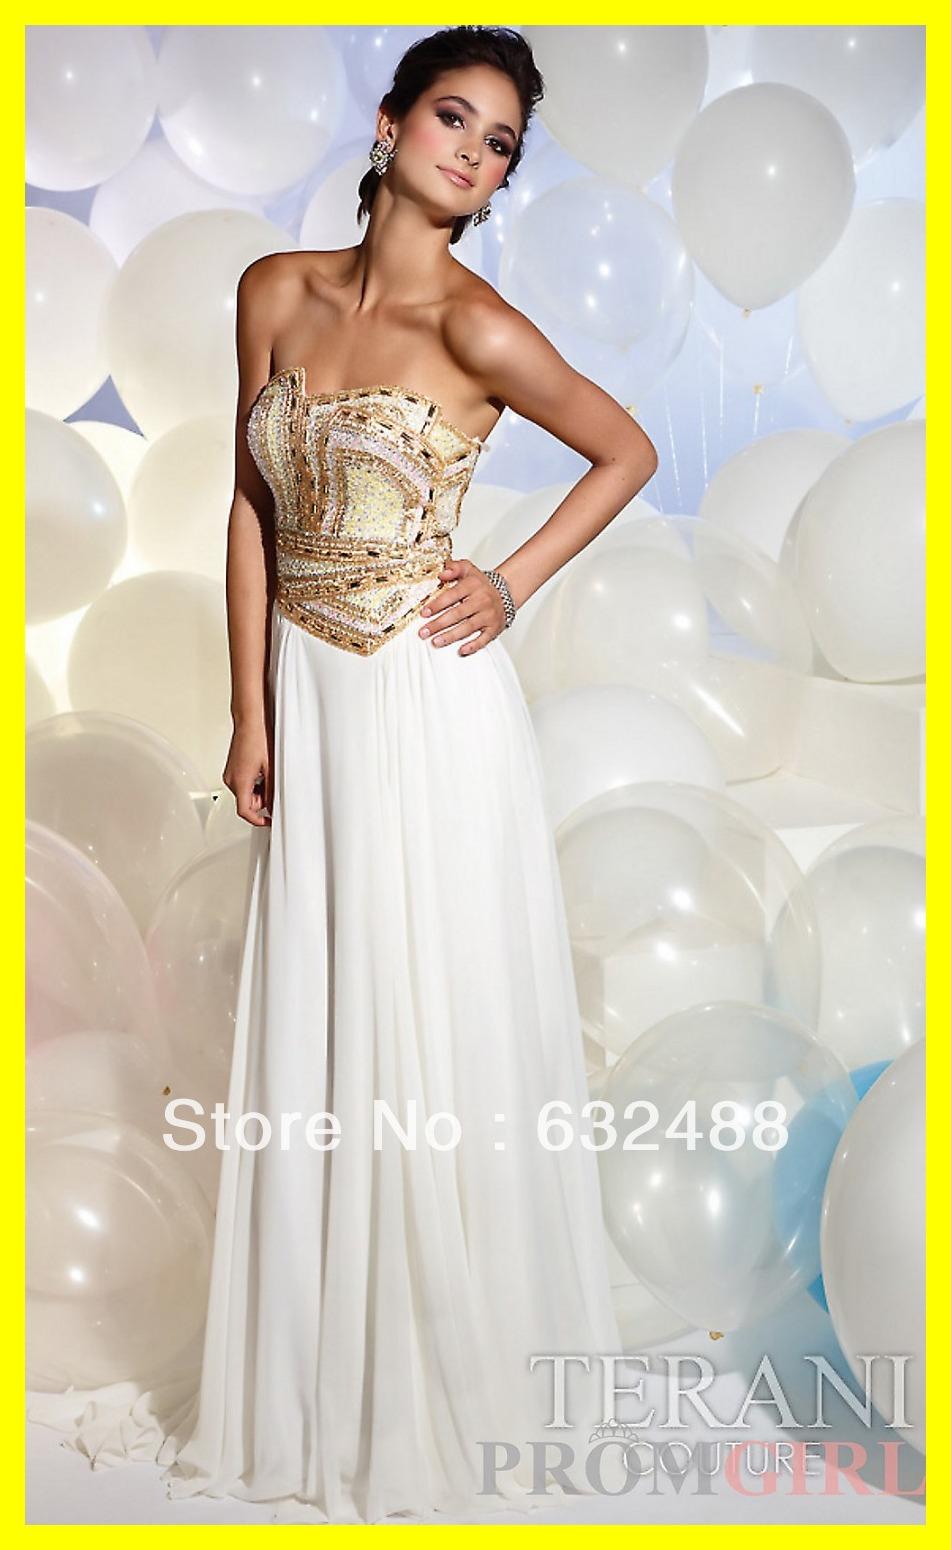 Dress hire essex bridesmaid dress hire essex ombrellifo Images